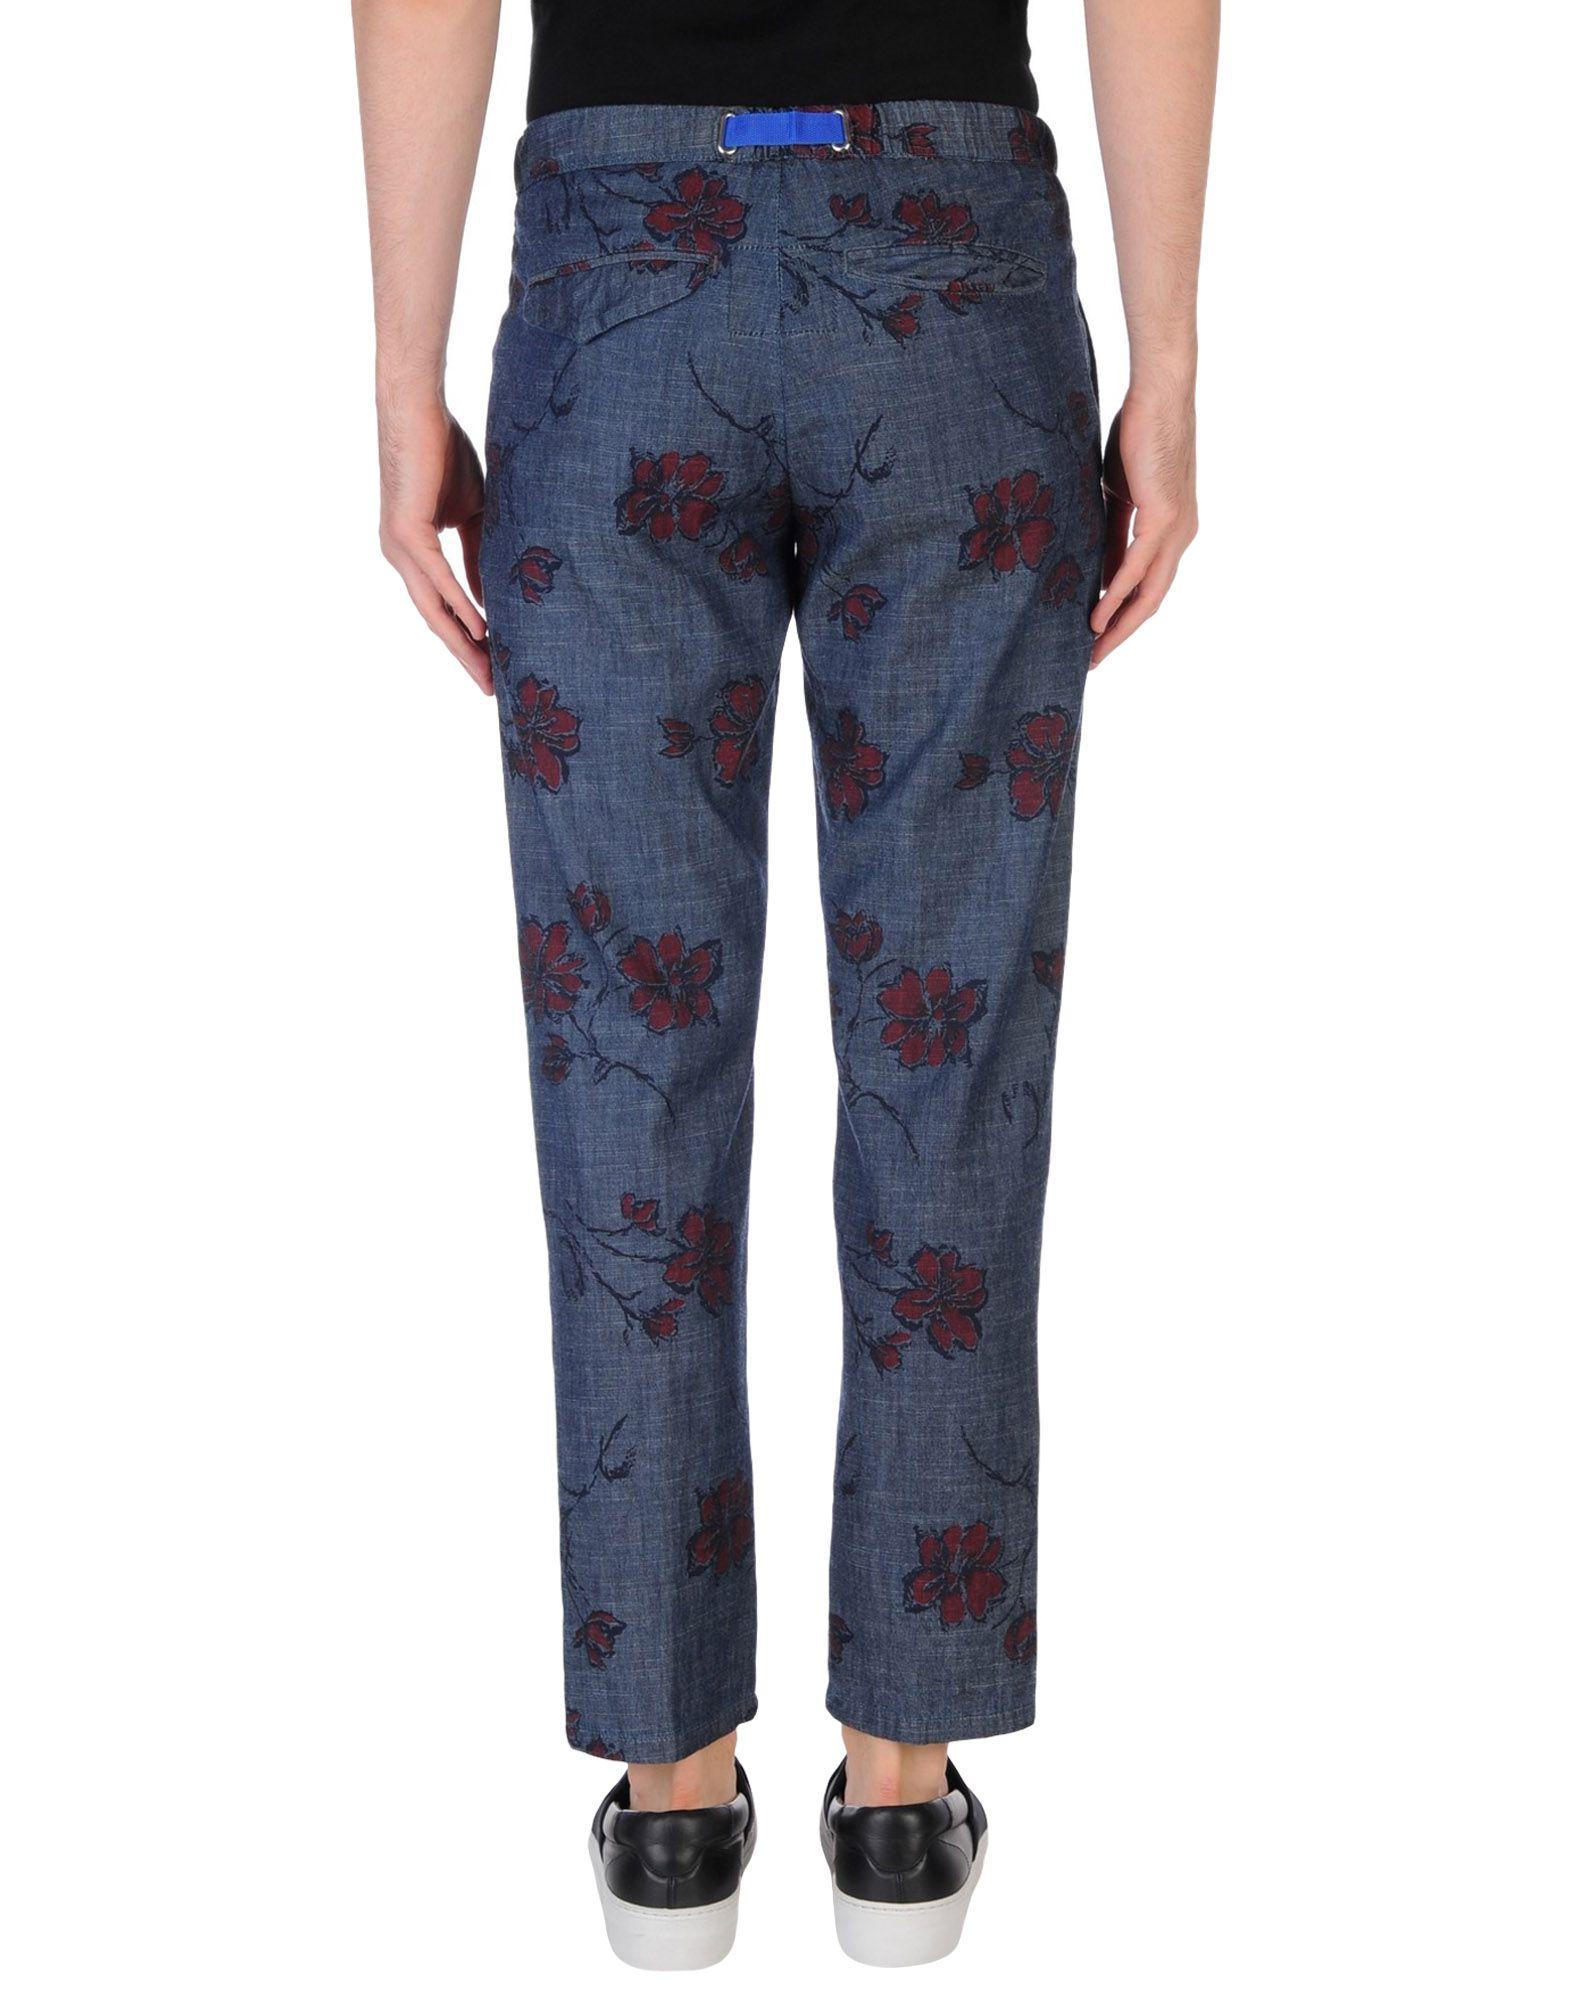 Pantaloni Jeans bianca Sand 88 Uomo - - - 42639188VM 531099